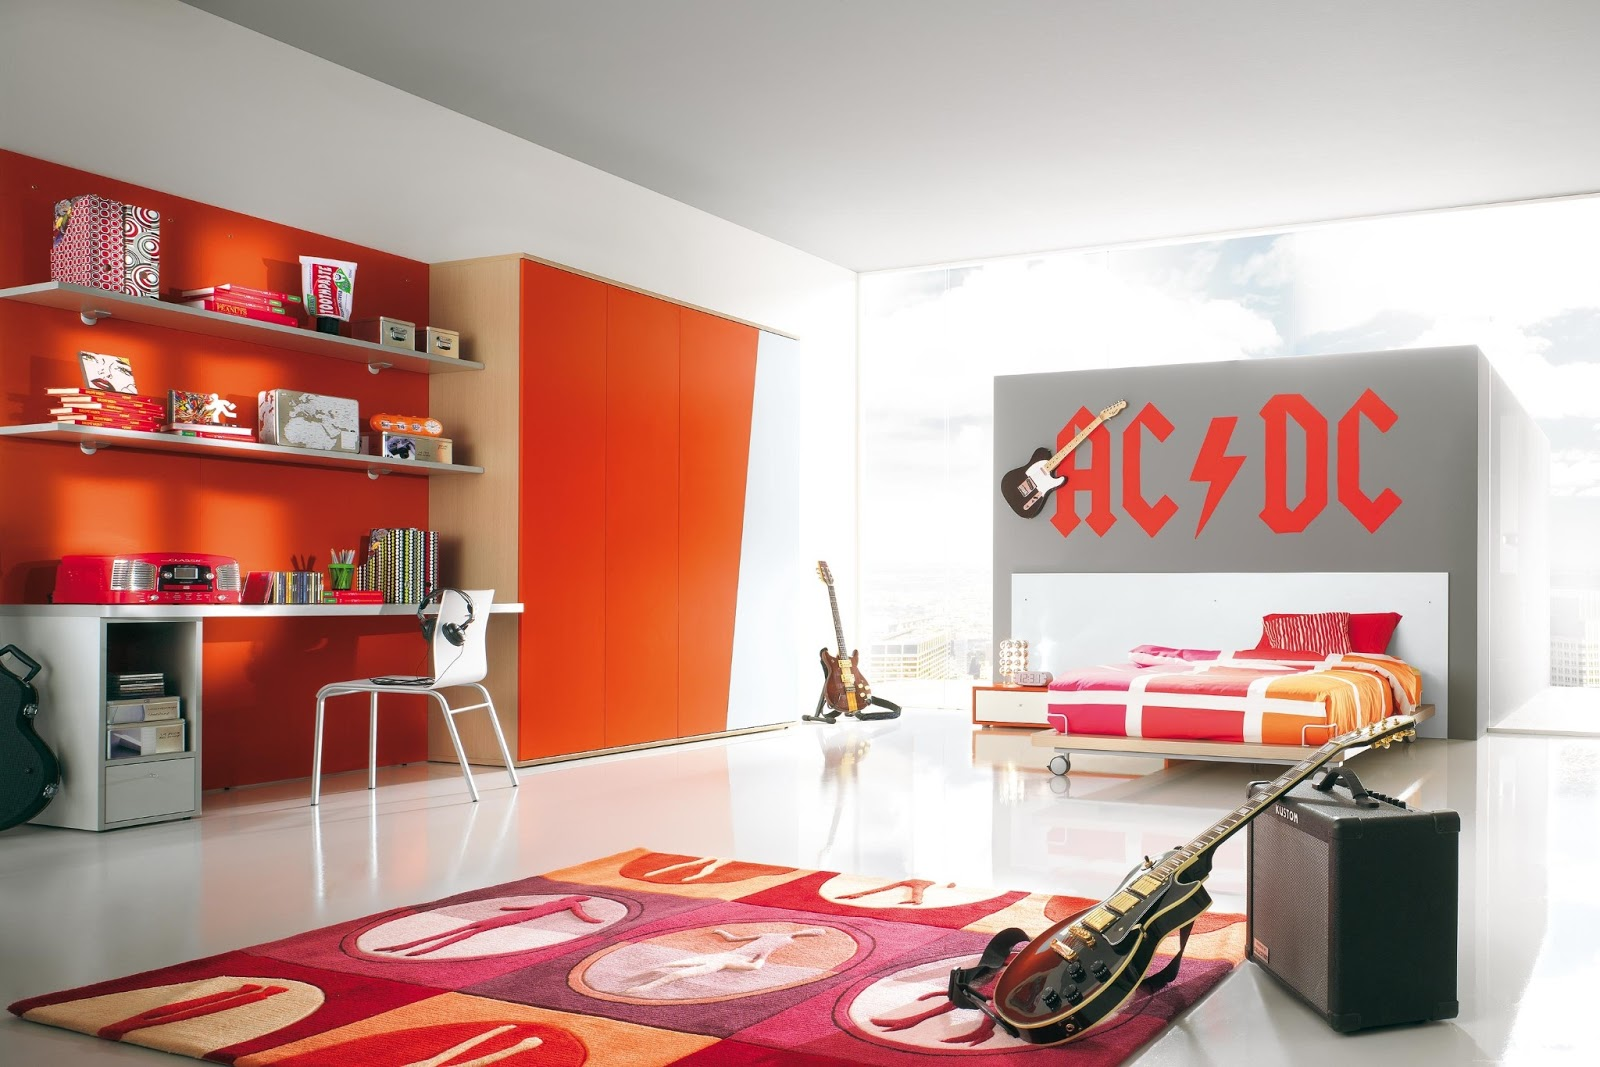 Decora tu hogar de acuerdo a tu gusto Musical 4